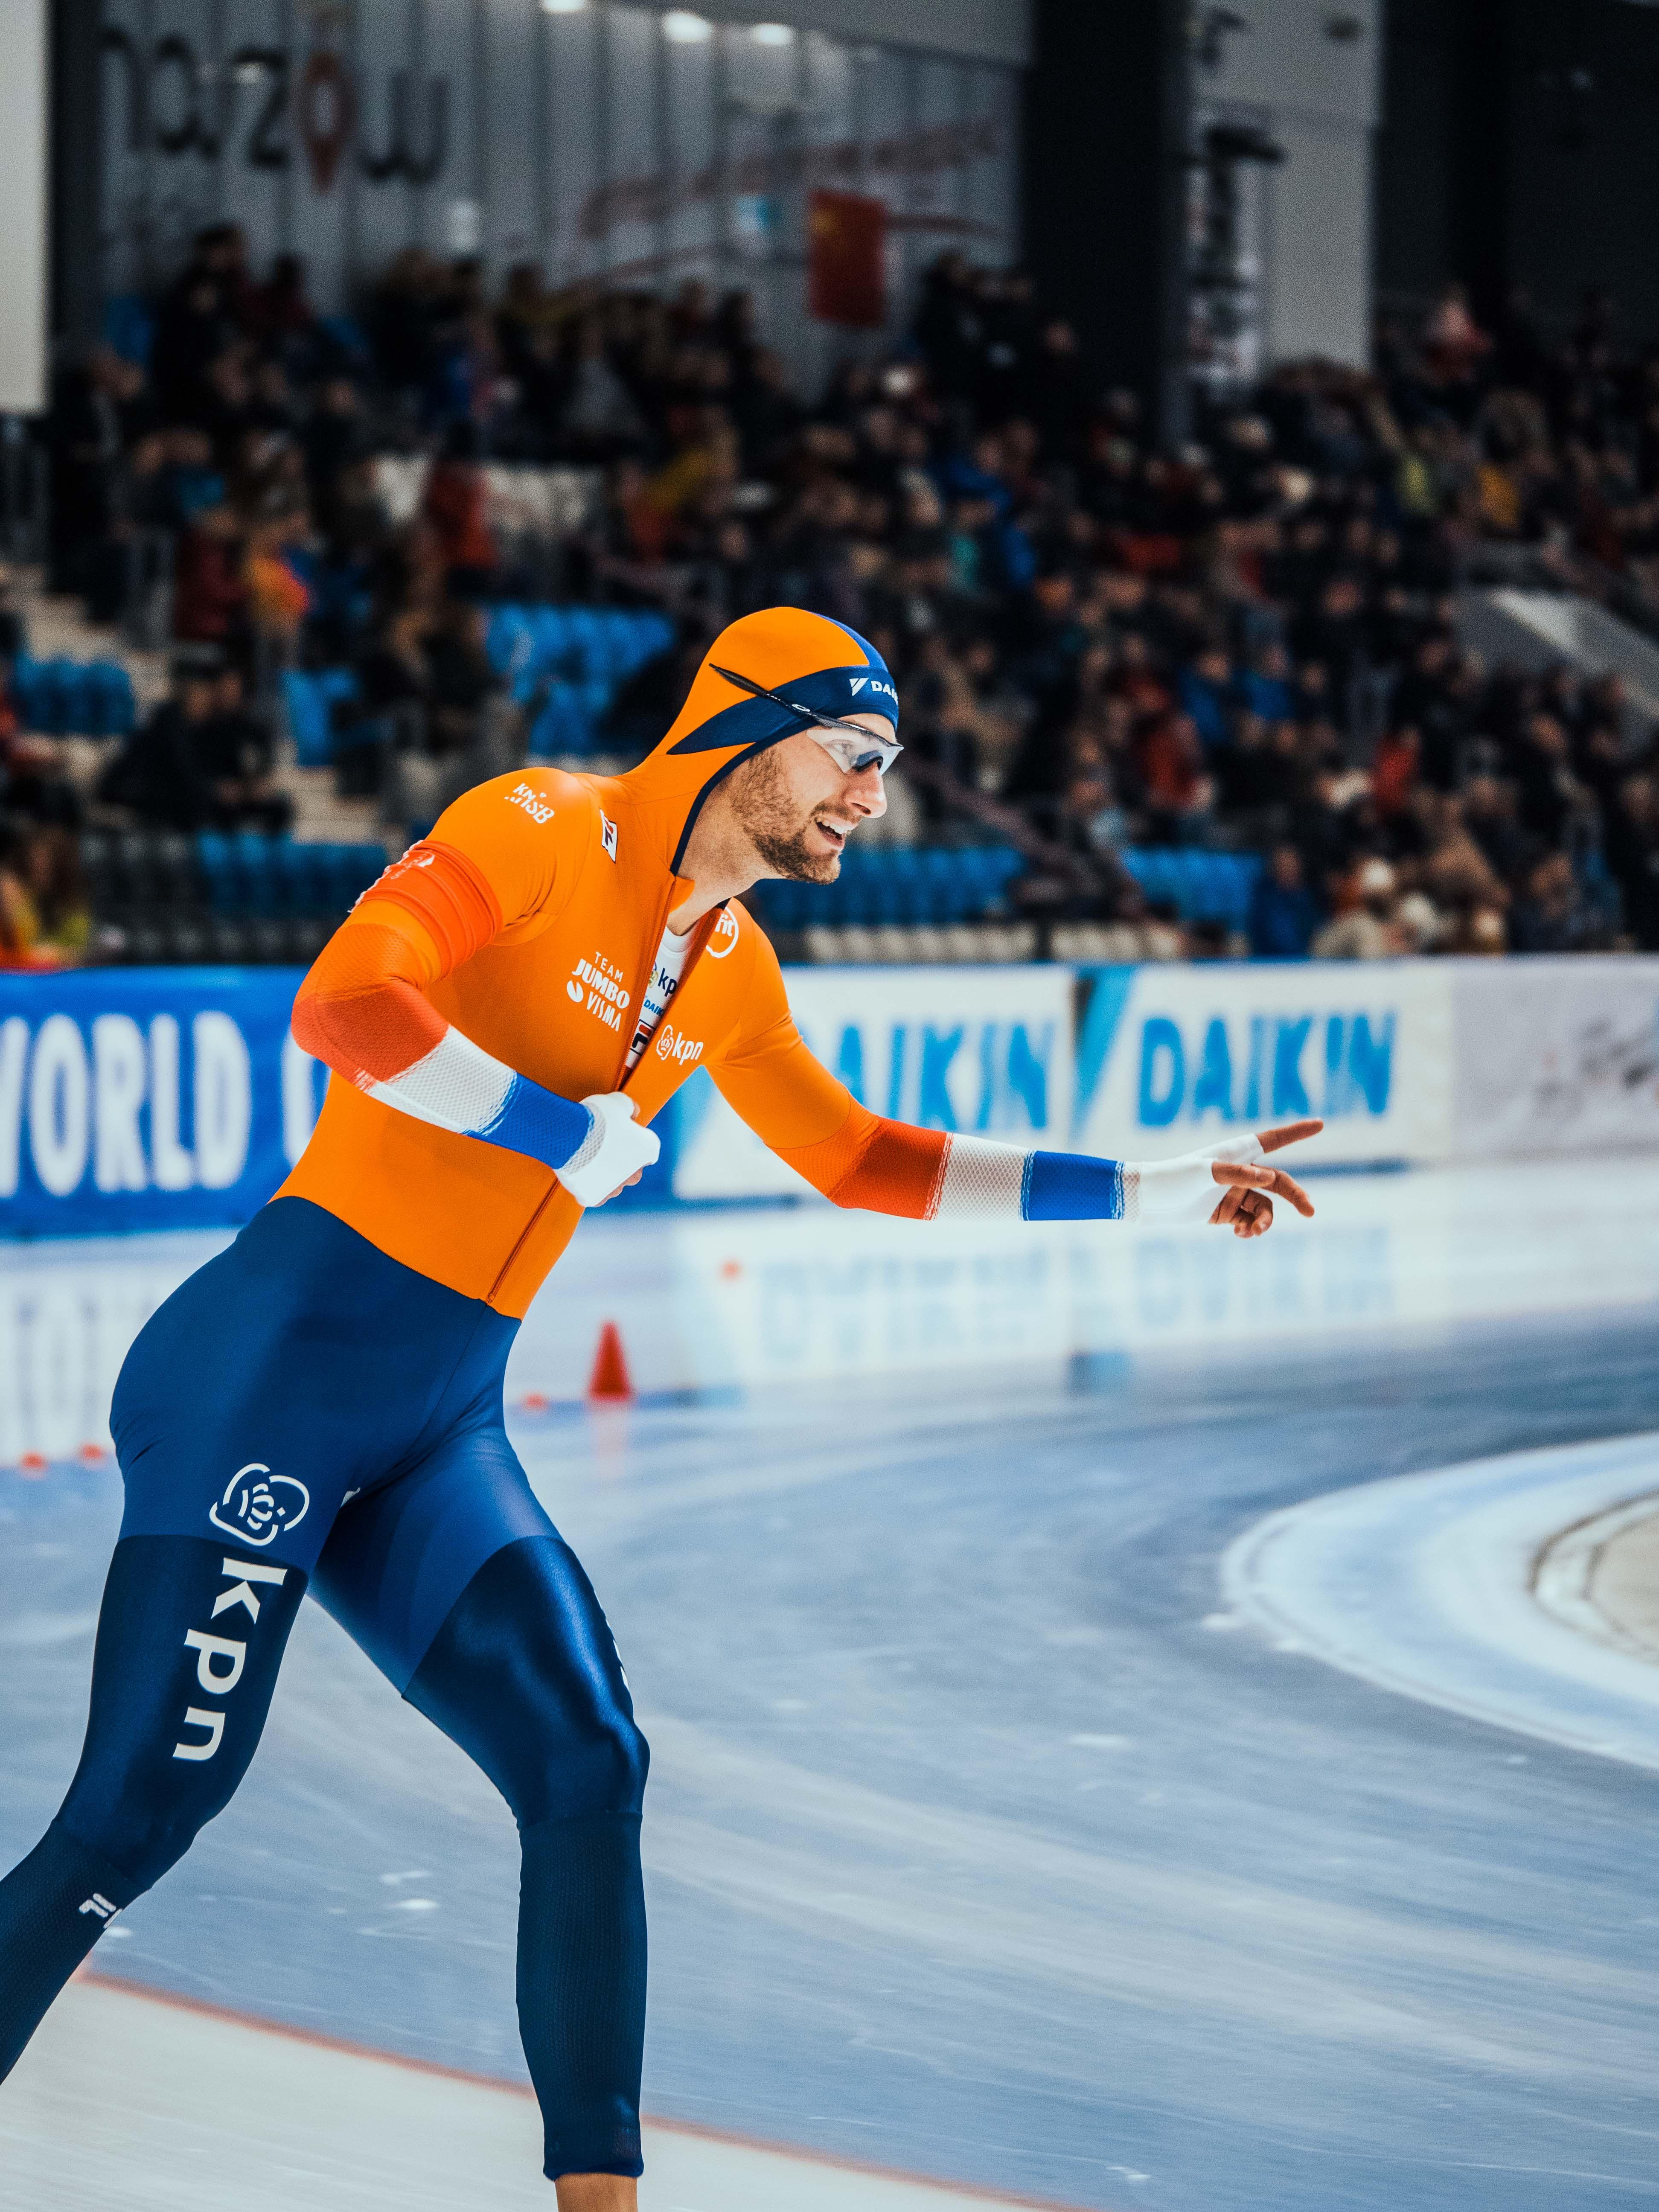 Thomas Krol, ISU World Cup Tomazsow